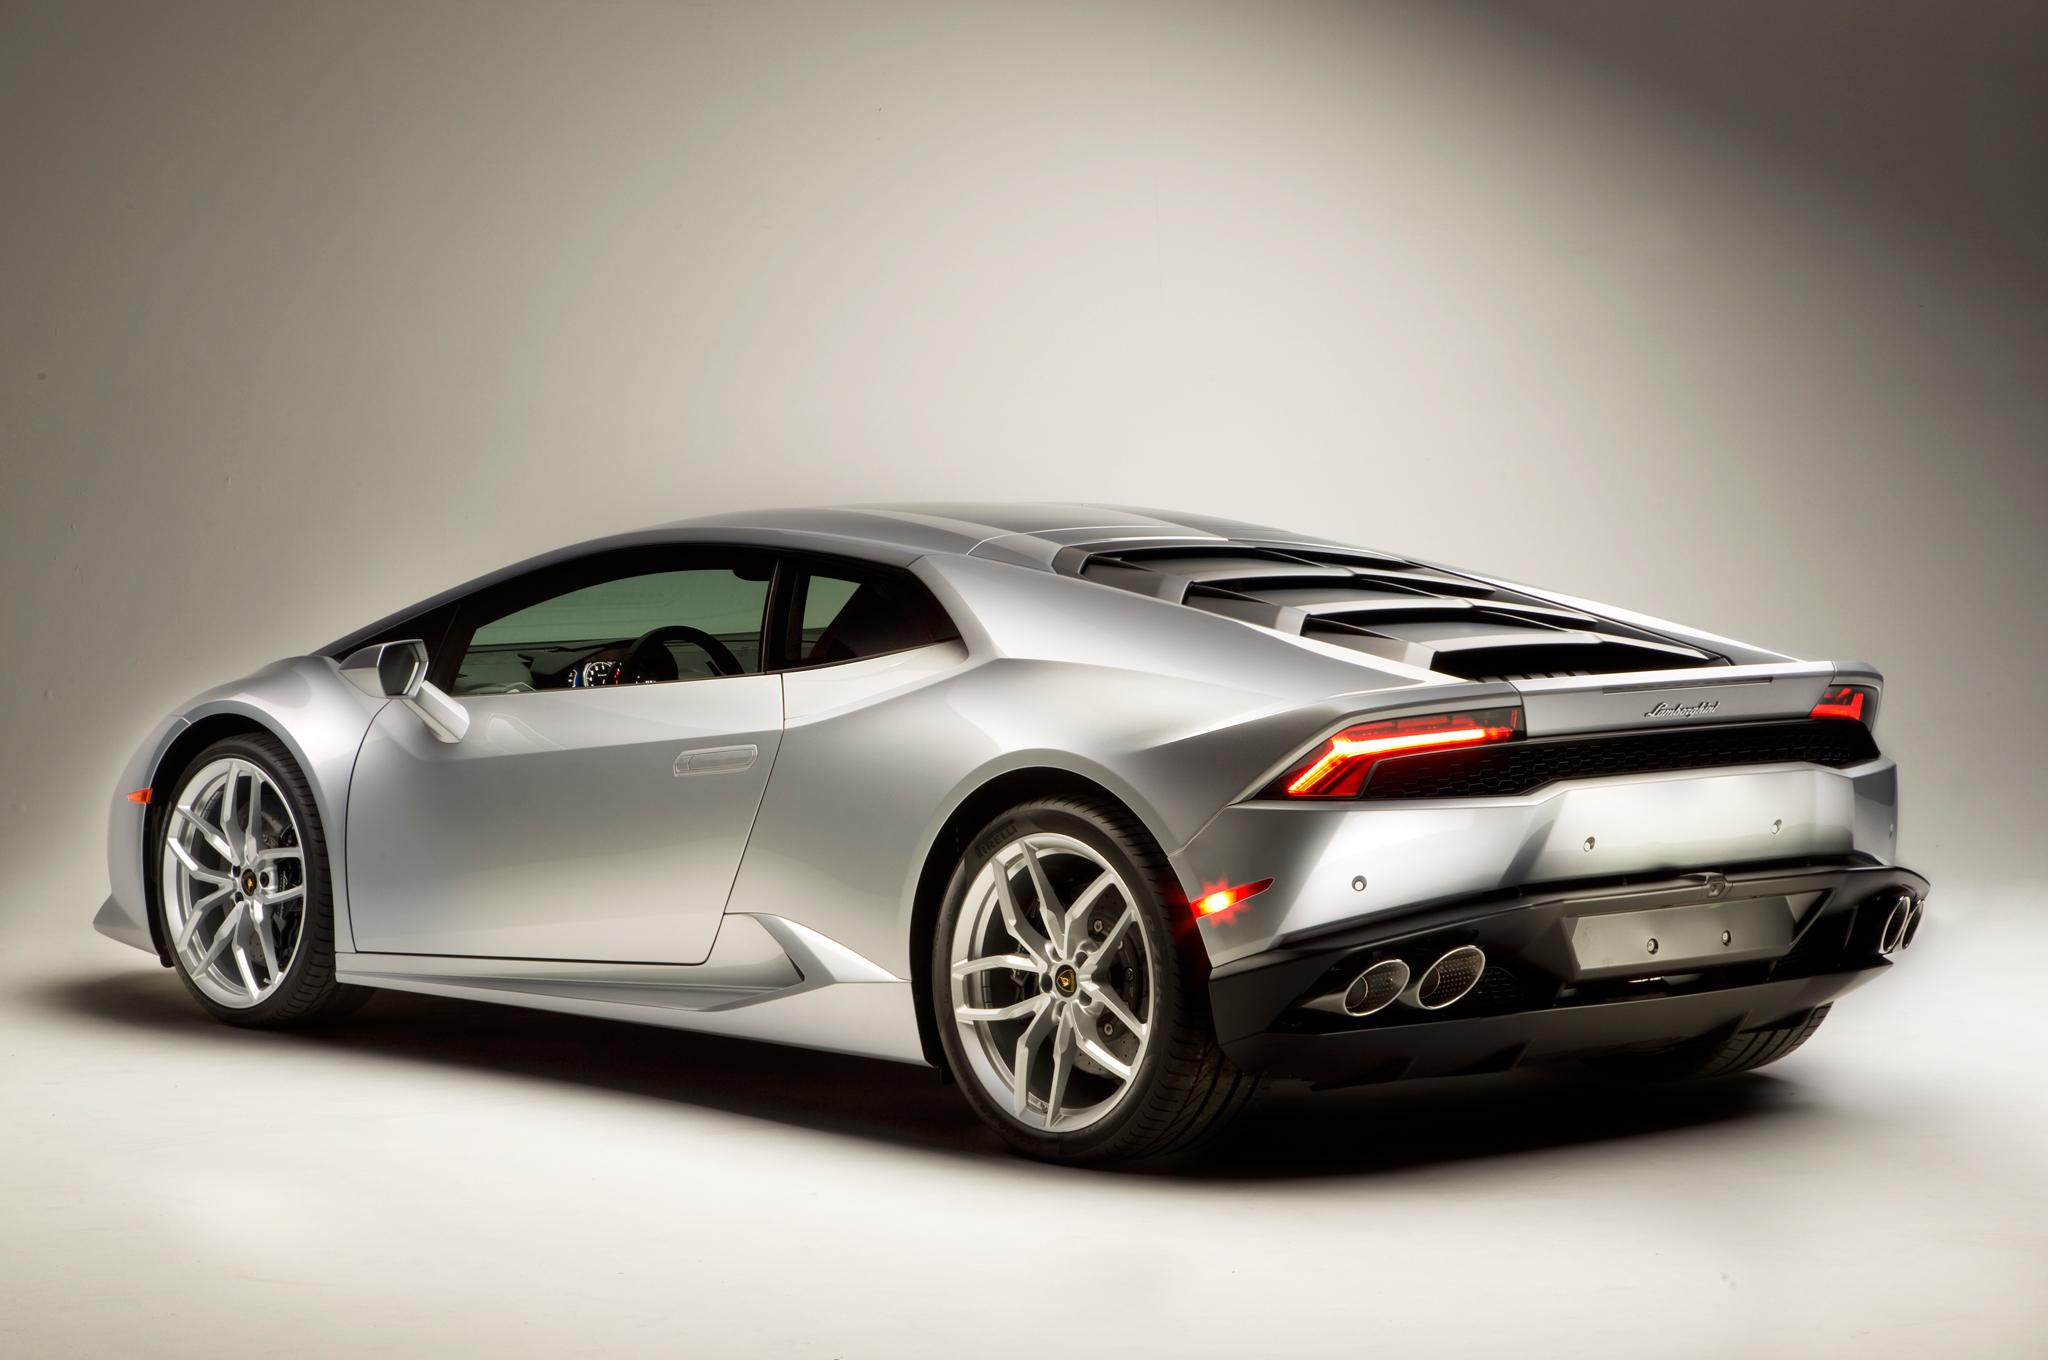 http—image.motortrend.com-f-roadtests-exotic-1312_2015_lamborghini_huracan_first_look-59412131-2015-Lamborghini-Huracan-rear-three-quarters